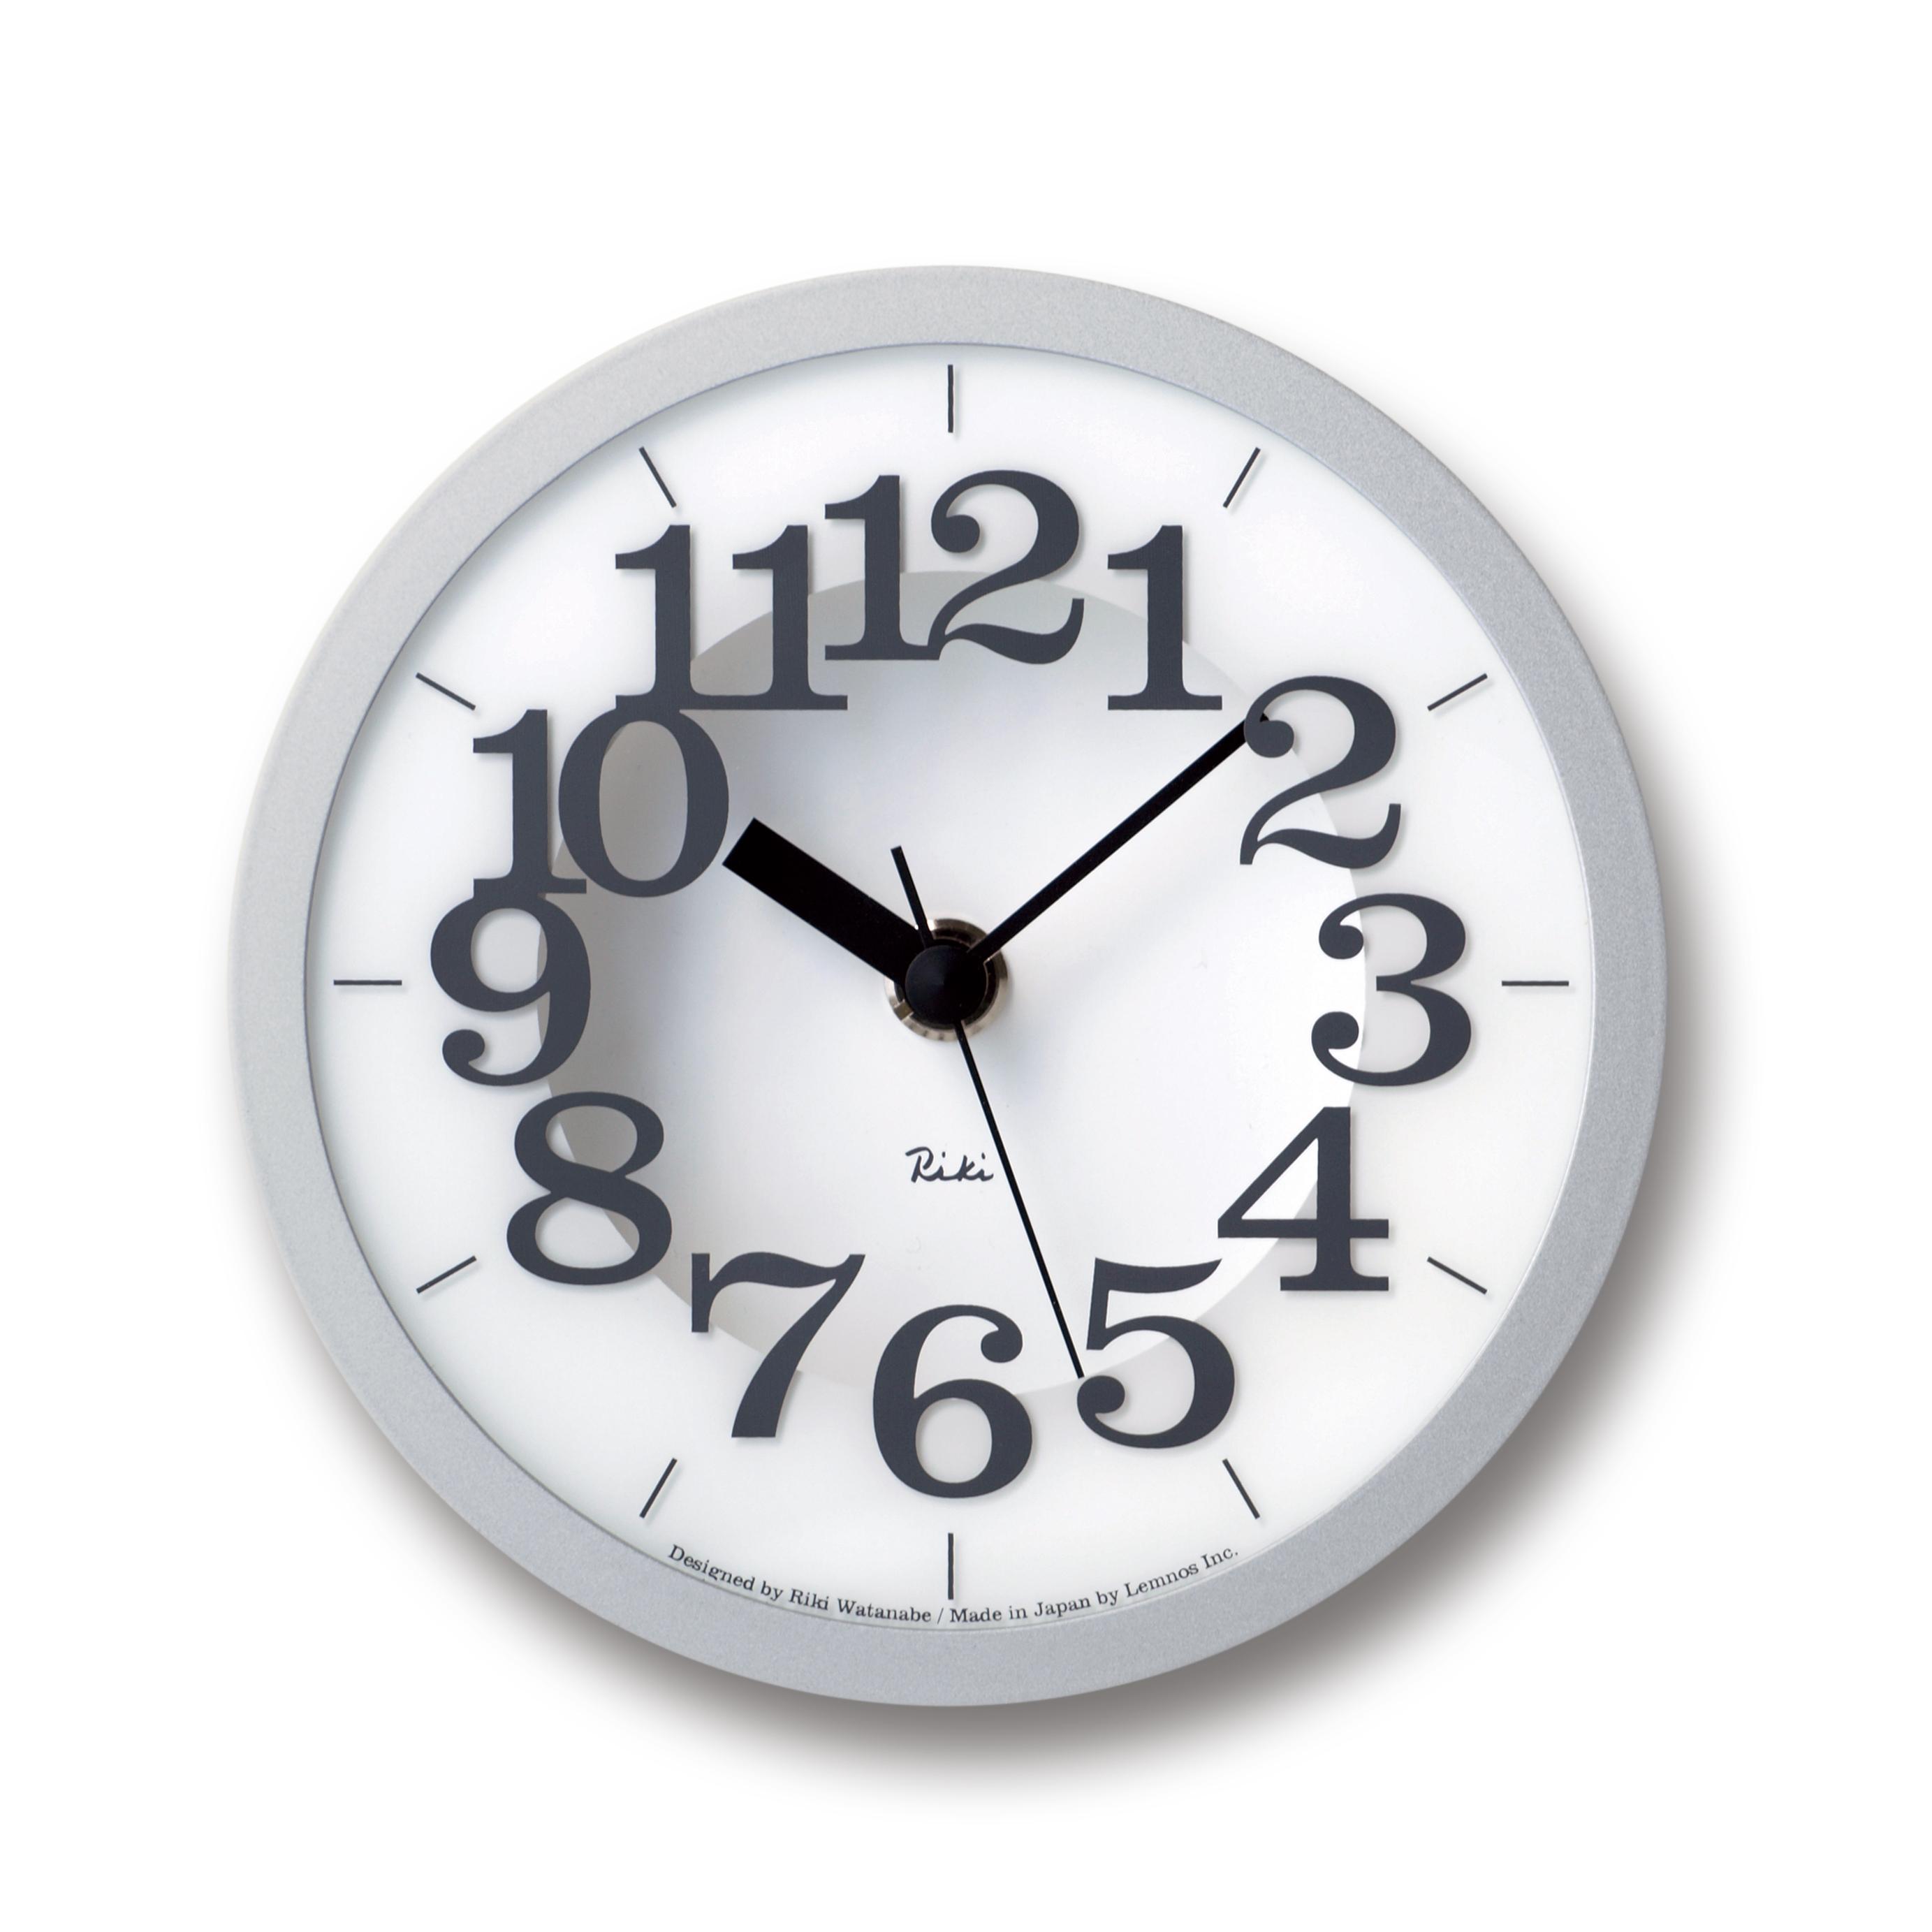 wanduhr riki air clock grau schlafzimmer wanduhren wanduhren wanduhren tischuhren wecker. Black Bedroom Furniture Sets. Home Design Ideas